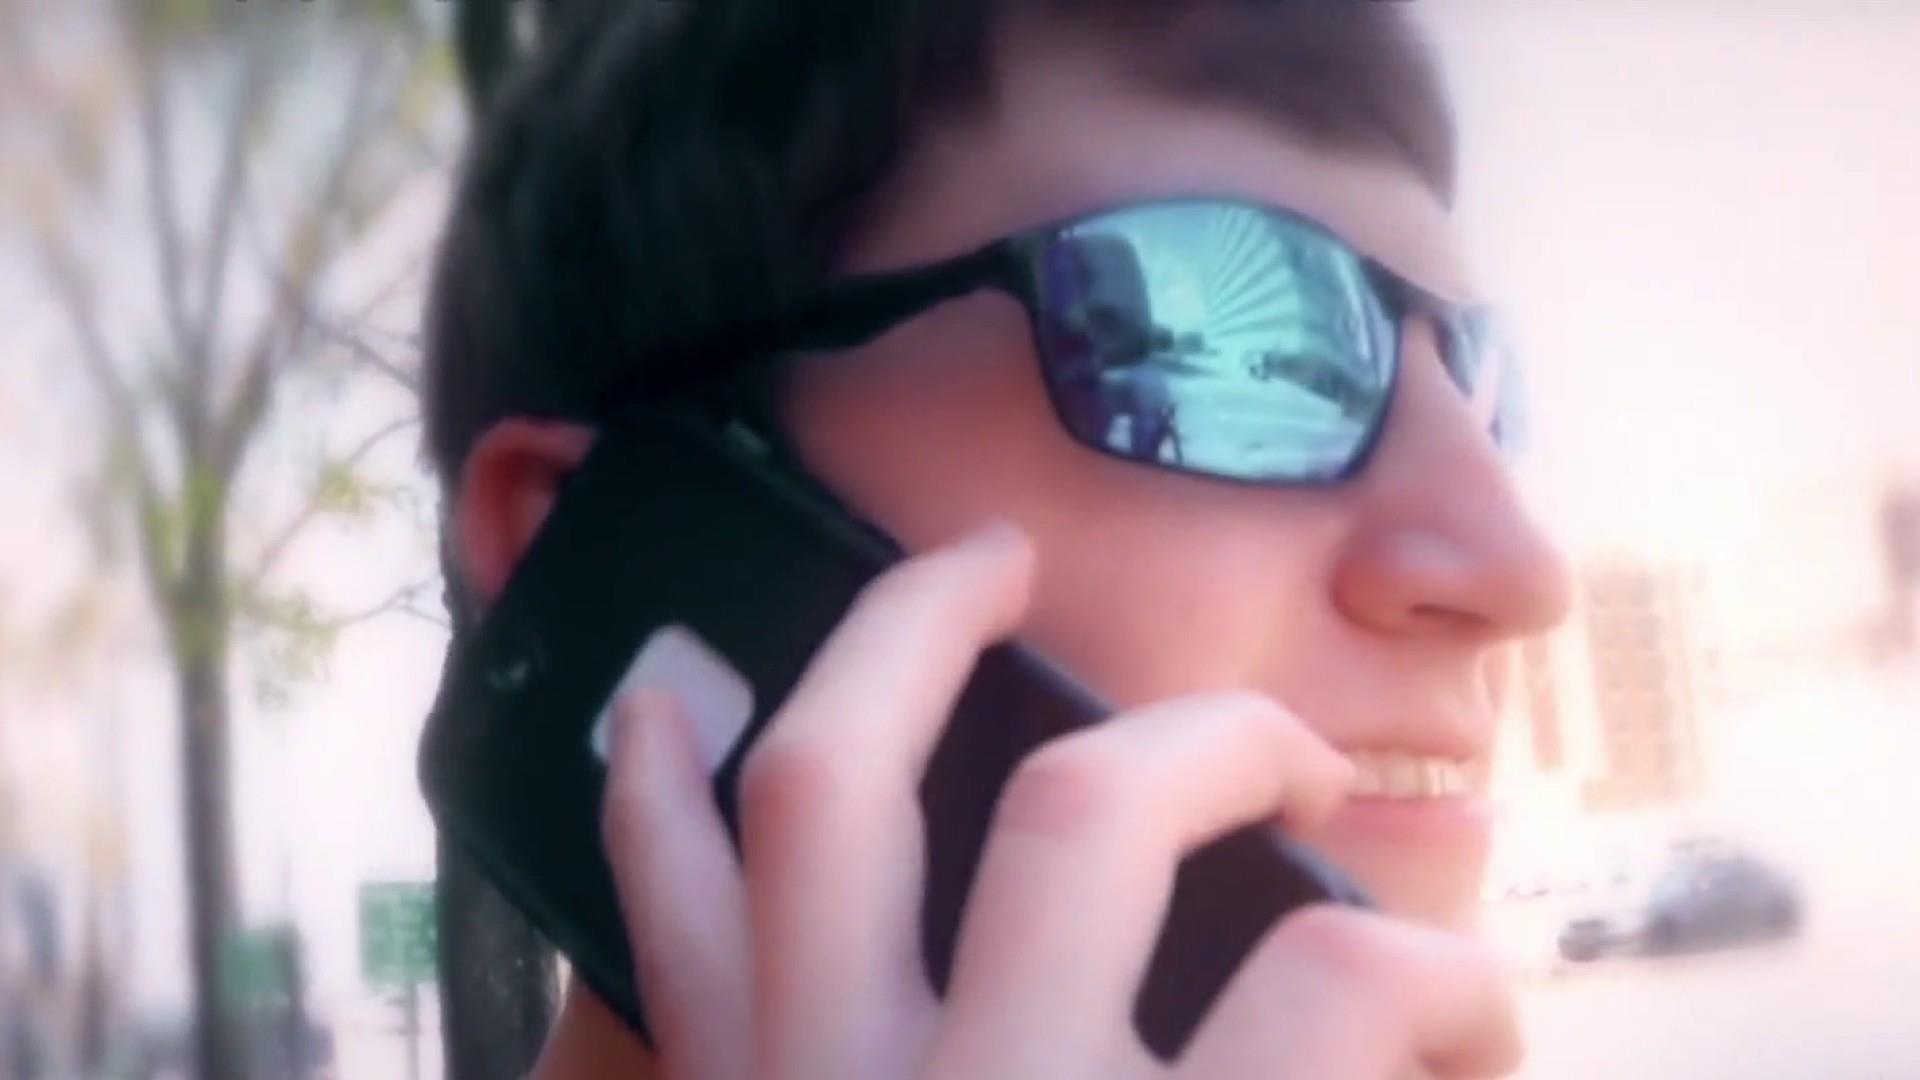 FCC chairman wants phone companies to block robocalls